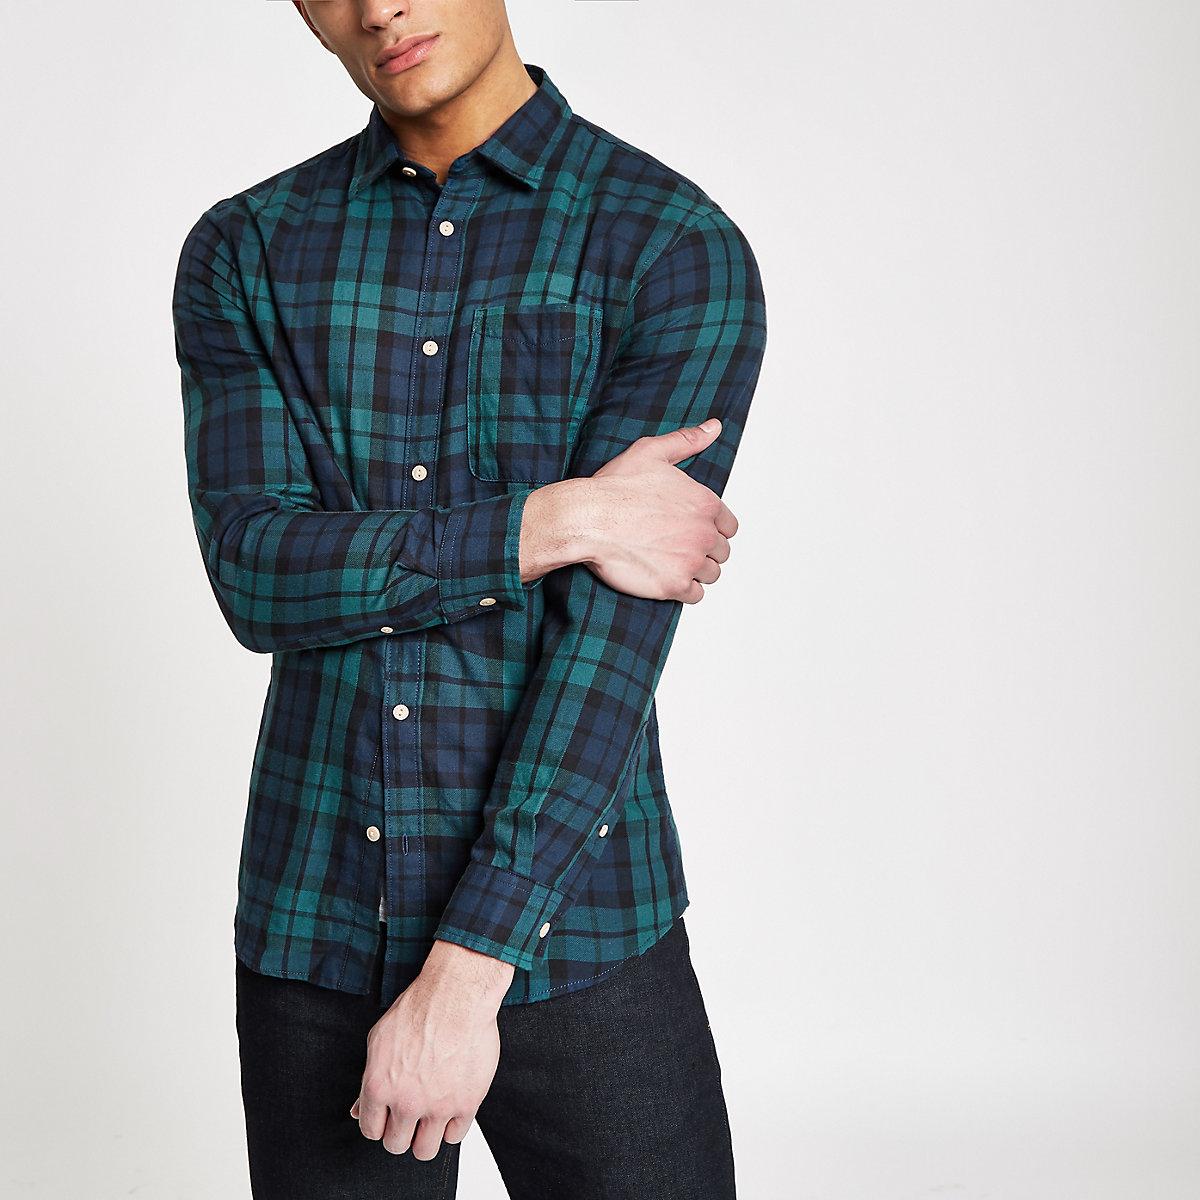 Jack & Jones Originals blue check shirt